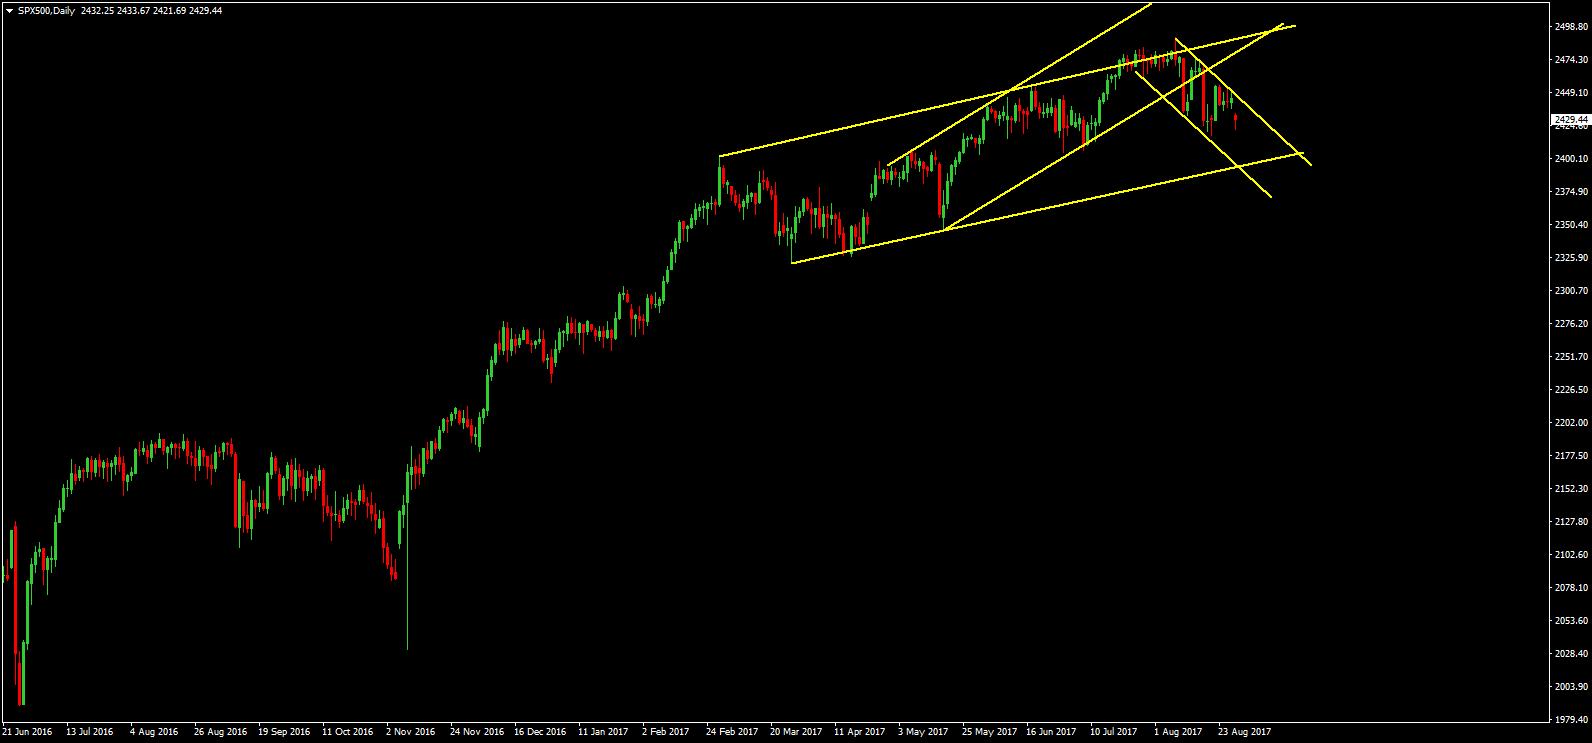 S&P500 30-08-2017